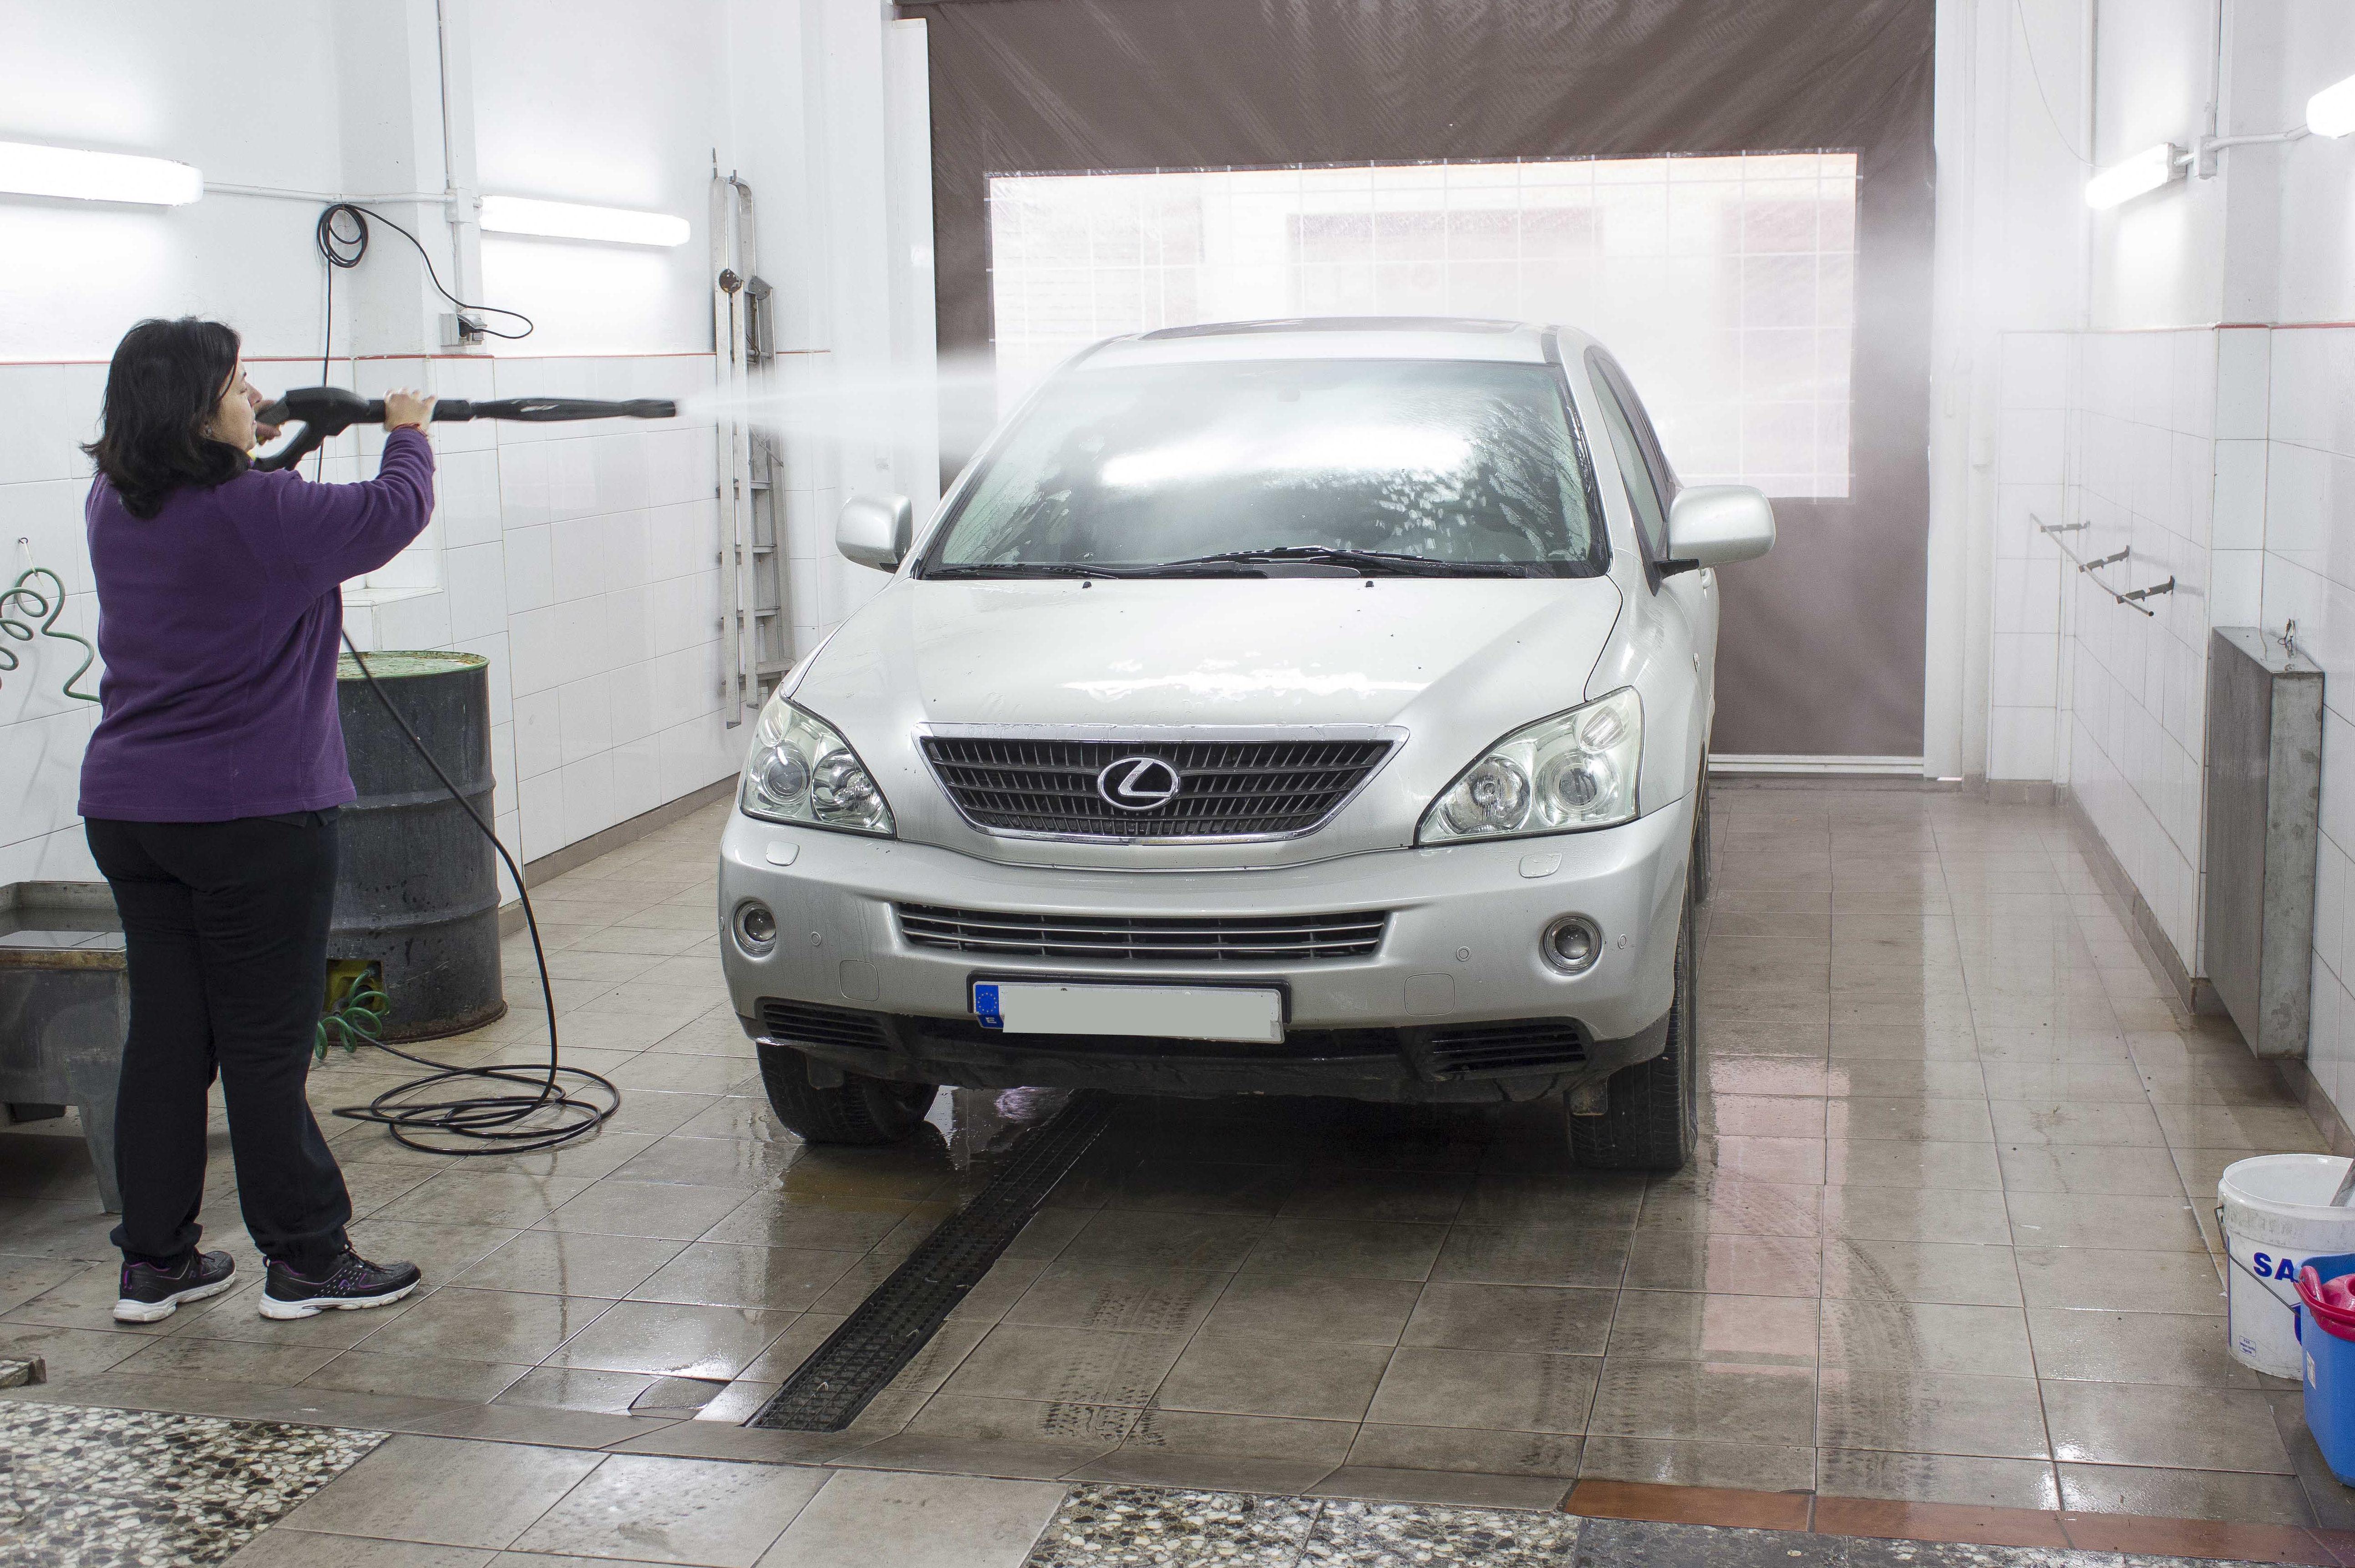 Lavado manual de automóviles - Lavadero de Coches Silla - Alcásser -  Picassent - Beniparrell